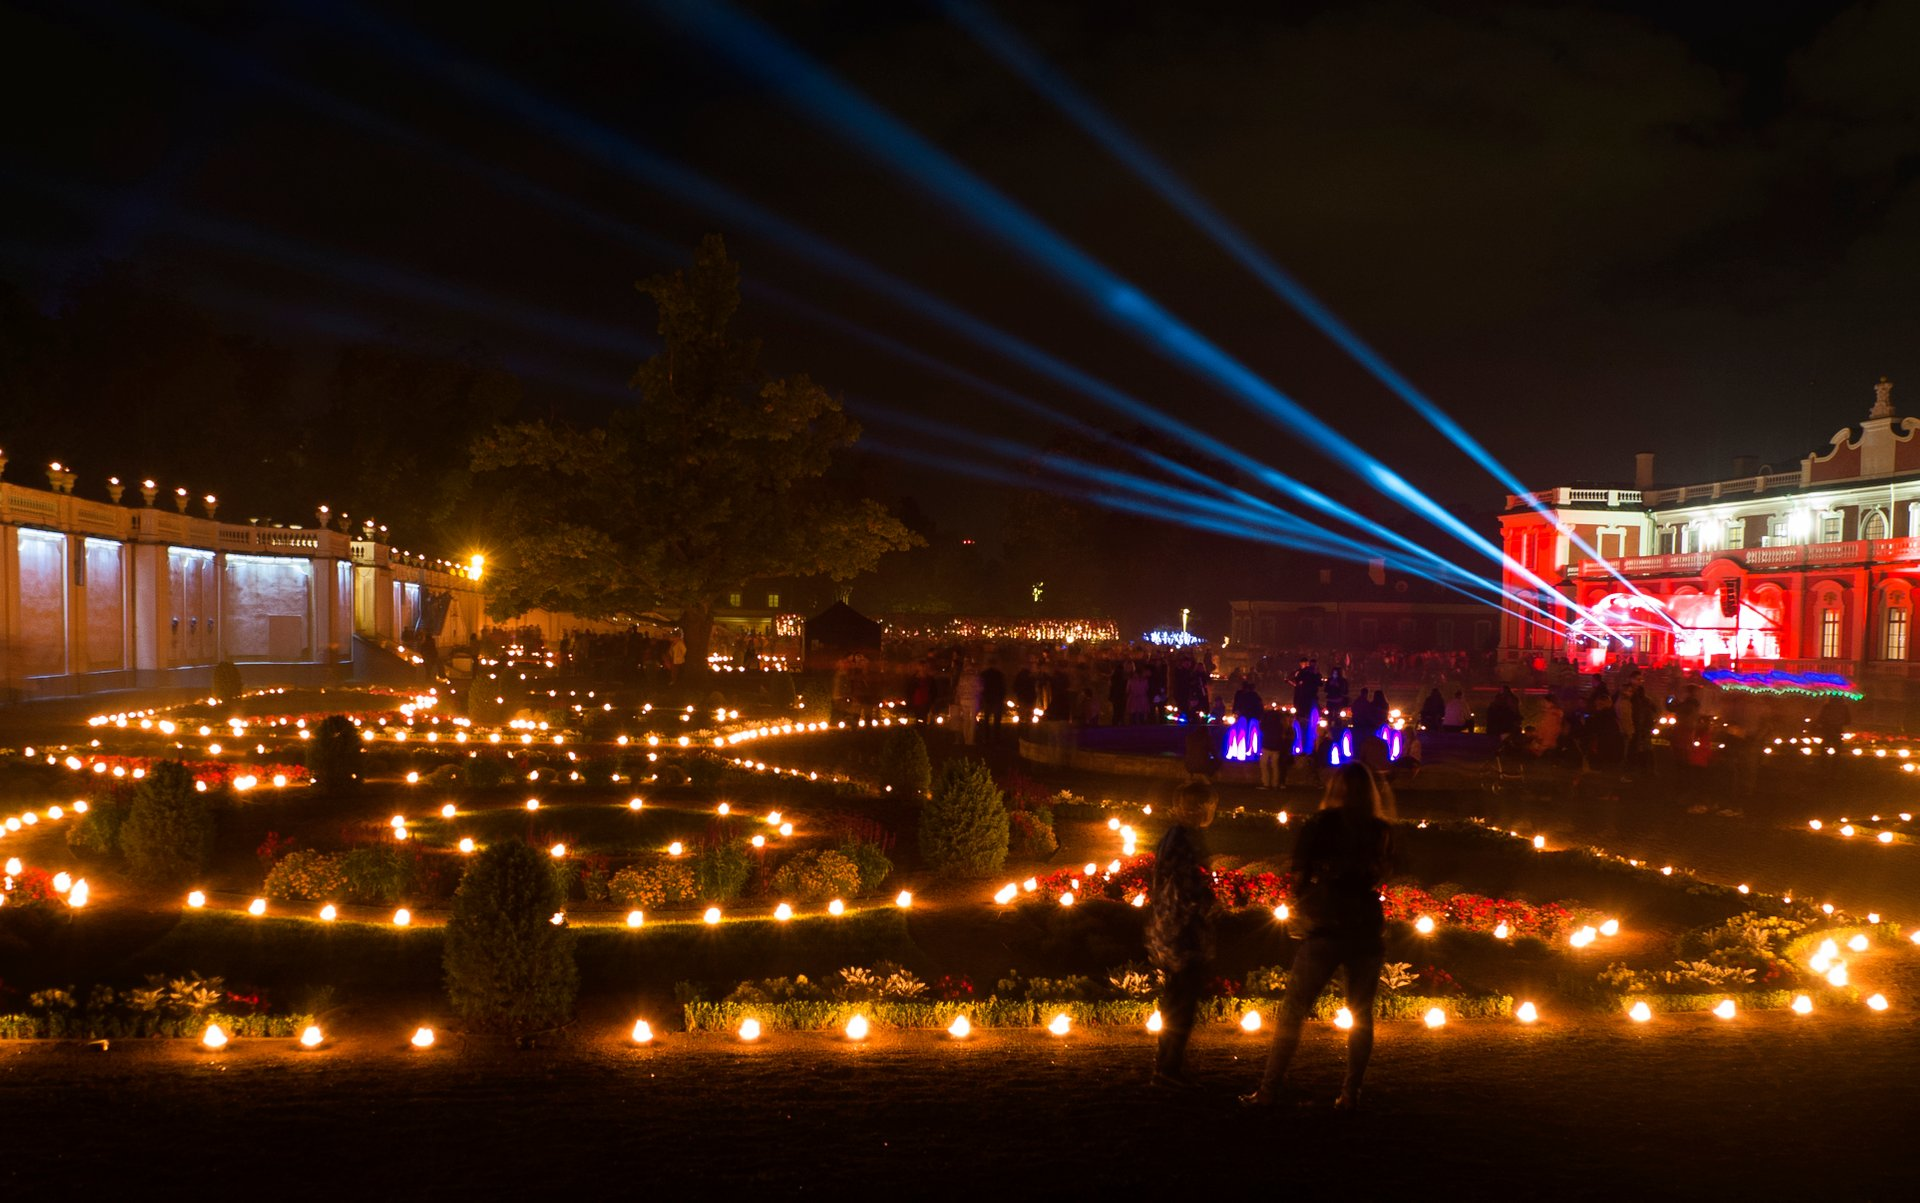 Light Walks in Kadriorg in Estonia - Best Time